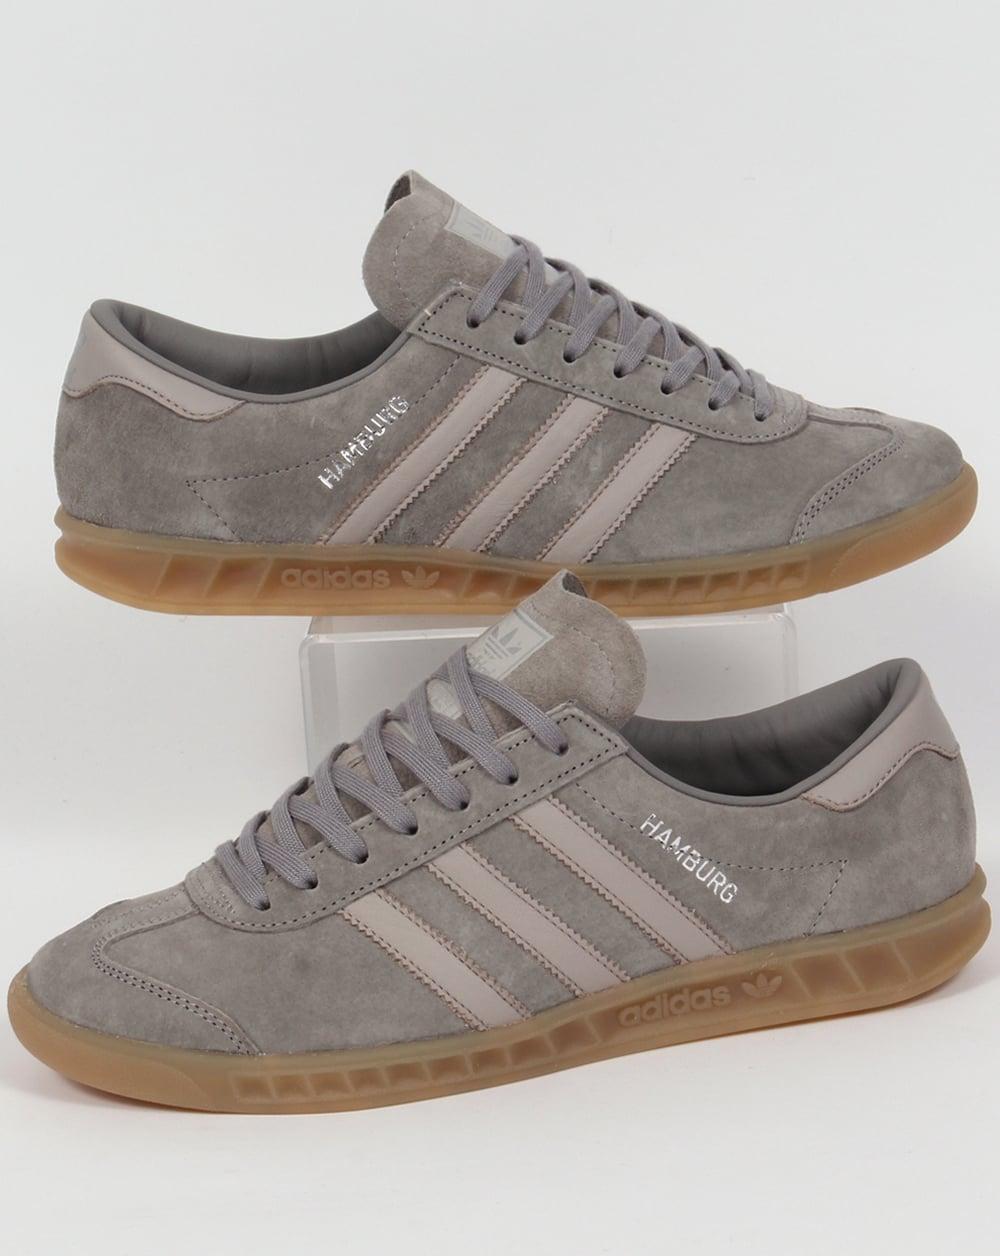 low cost 39f37 5014c adidas Trainers Adidas Hamburg Trainers Granite Grey